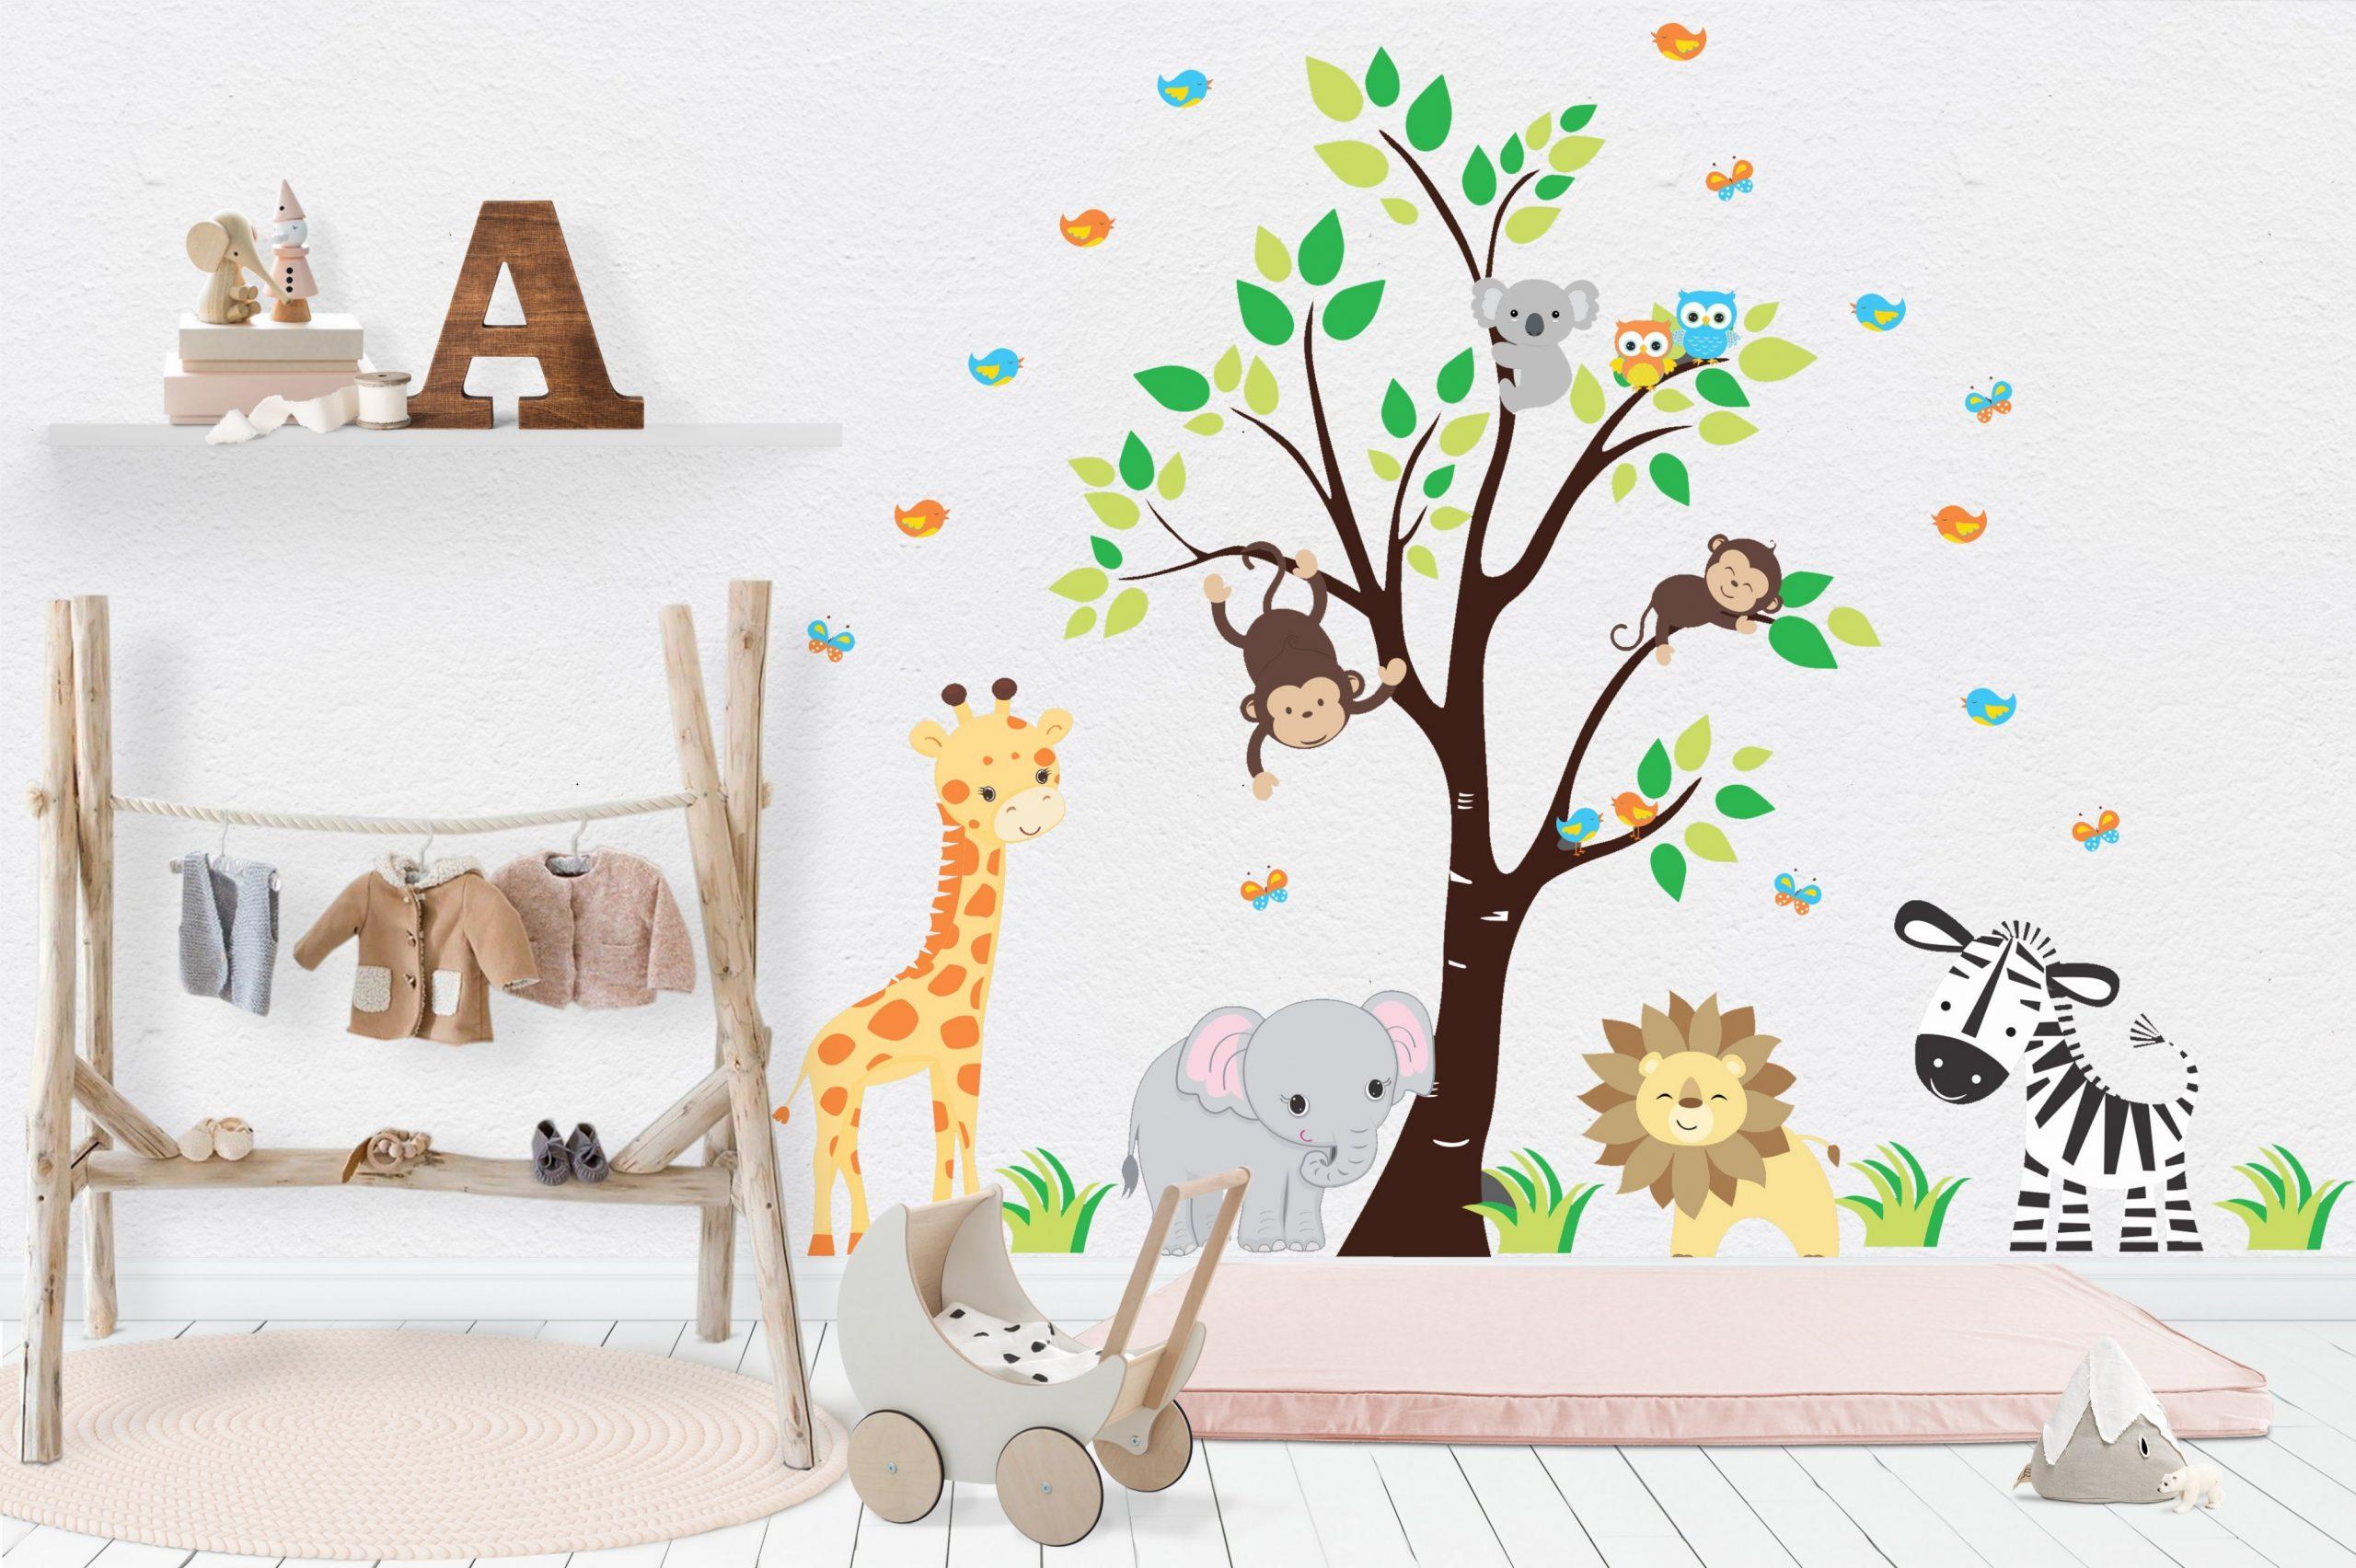 Nursery Wall Decals - Safari Nursery Stickers - Baby Room Decals  - Baby Room Stickers